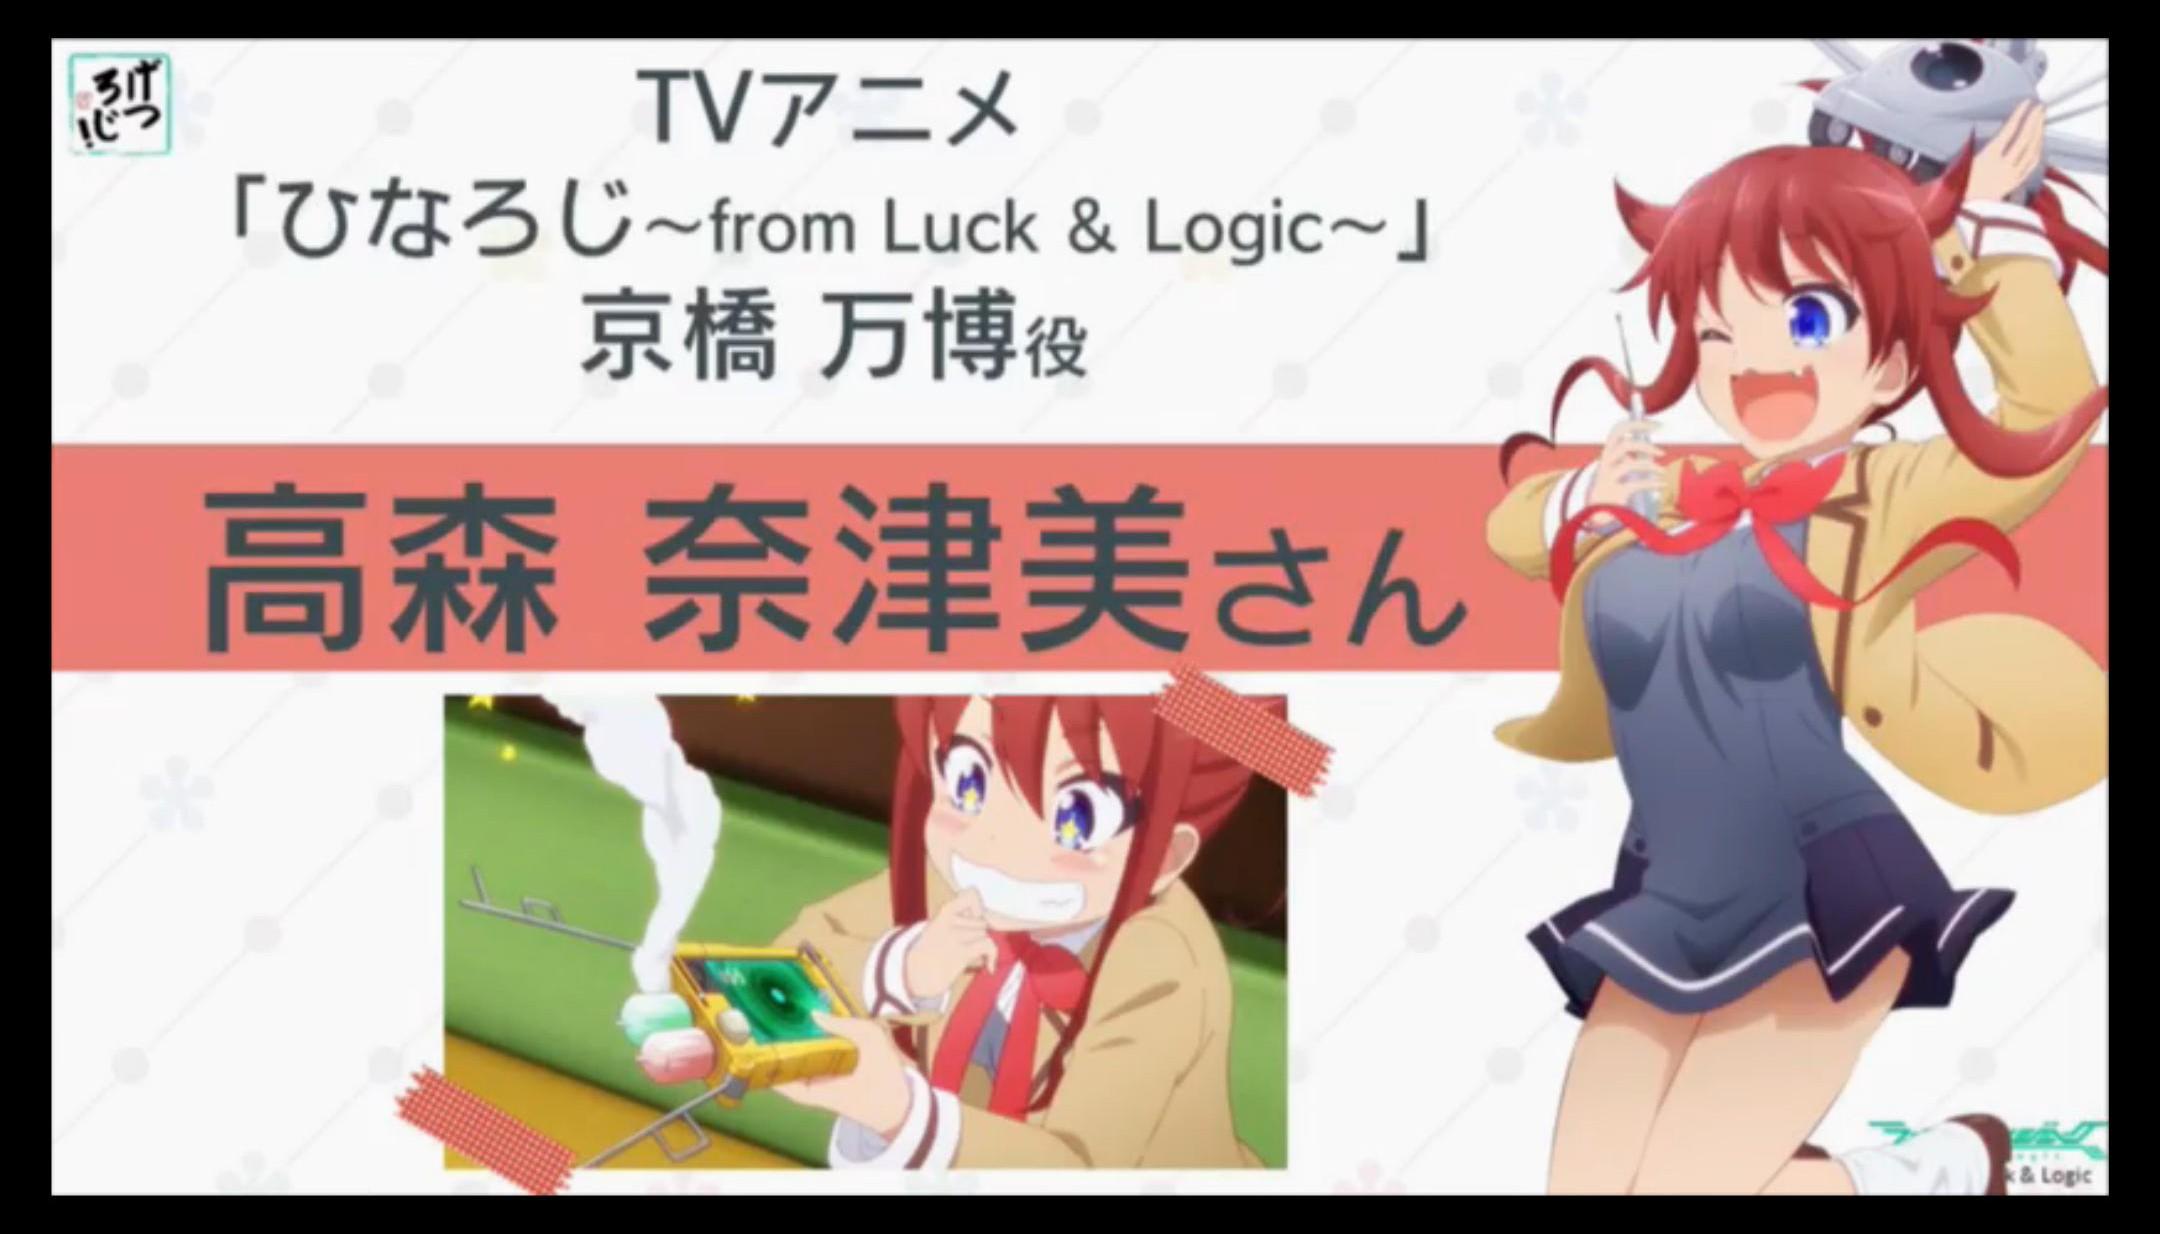 luckandlogic-live-170605-000.jpg